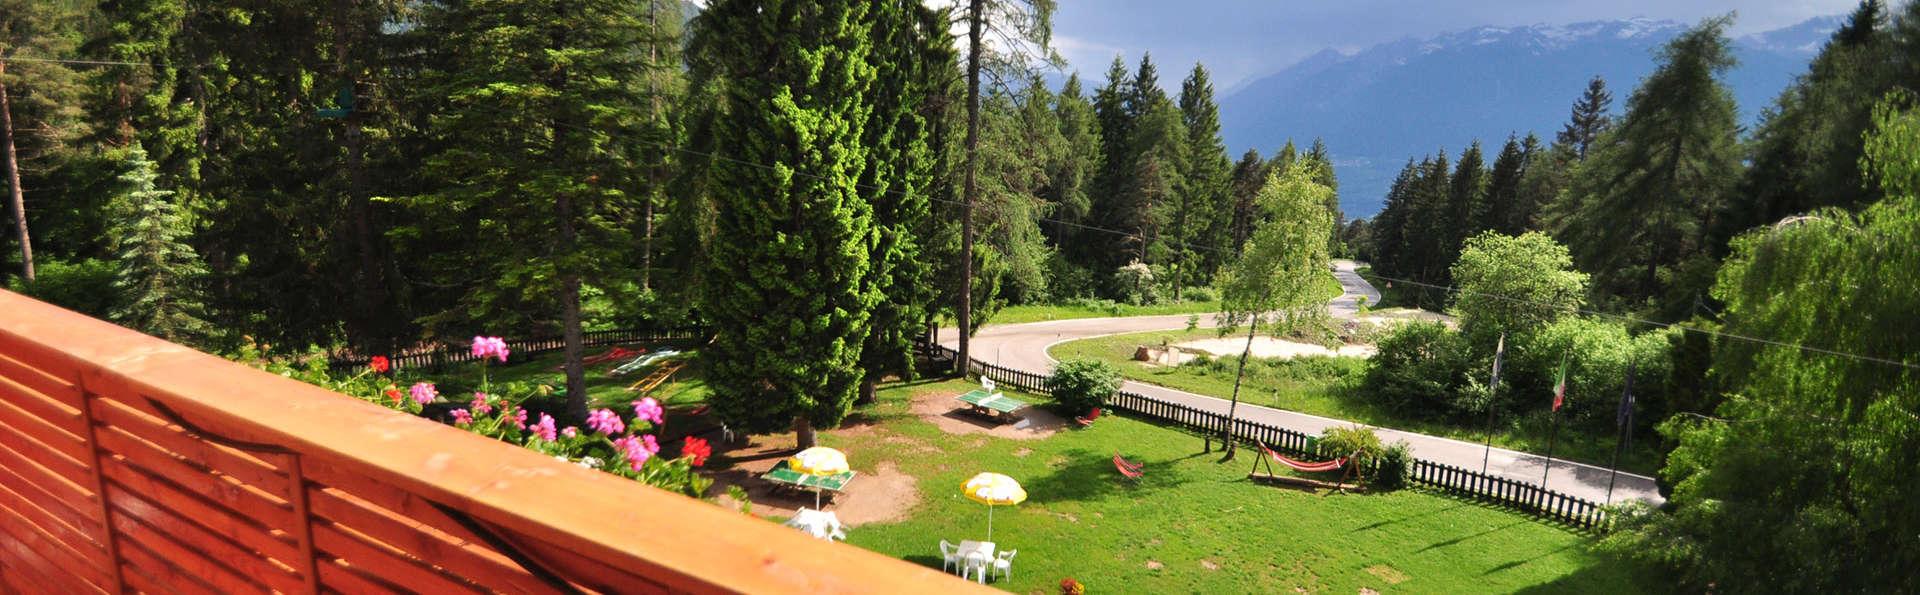 Hotel Rifugio Sores - EDIT_fronte_estate_14.jpg